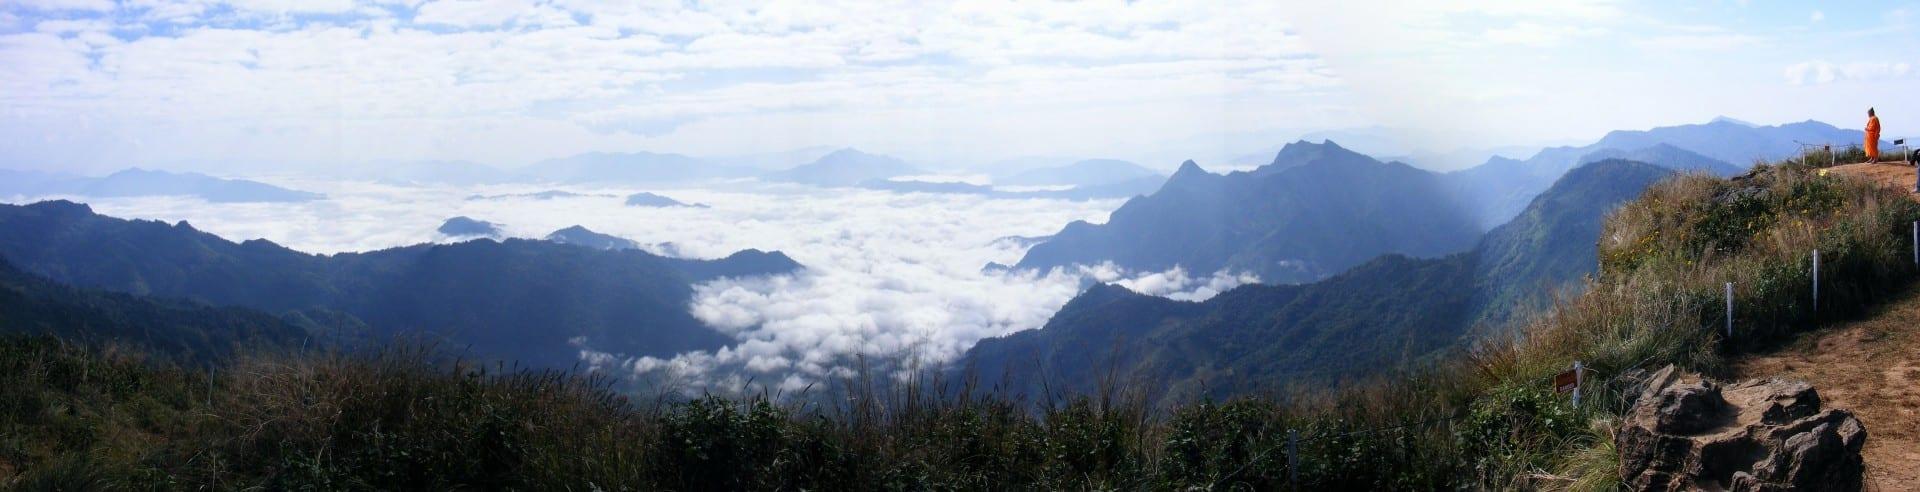 Phucheefah Chiang Rai Tailandia